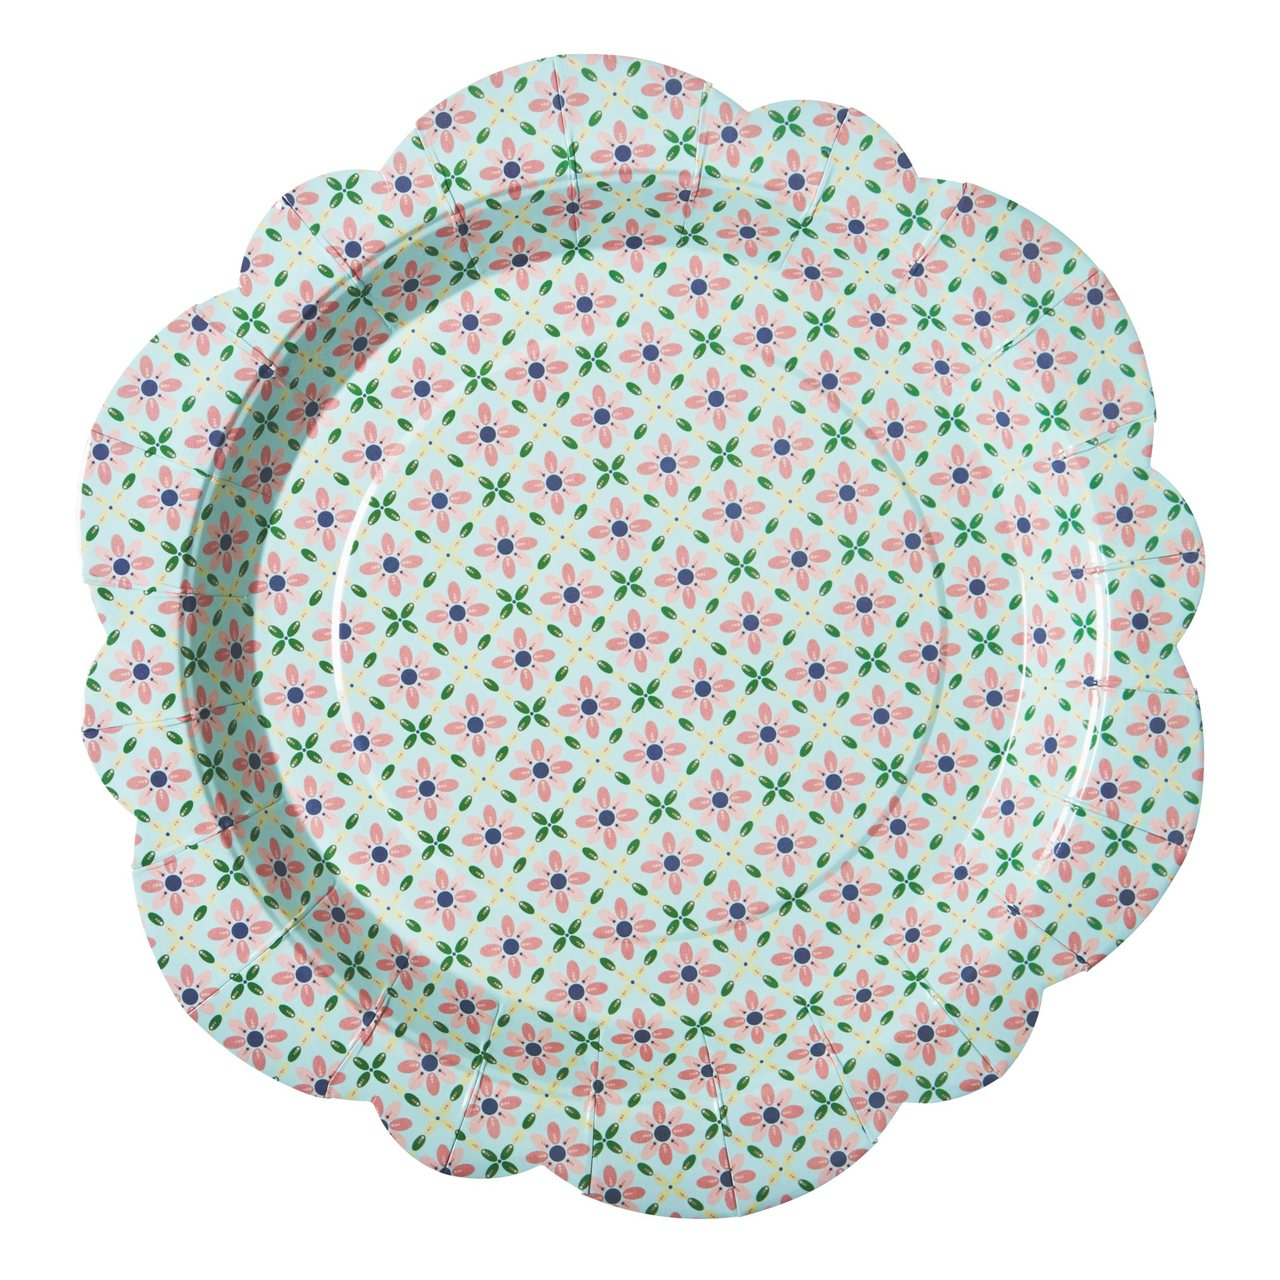 8 Flower Shaped paper plates in Flower Tile print